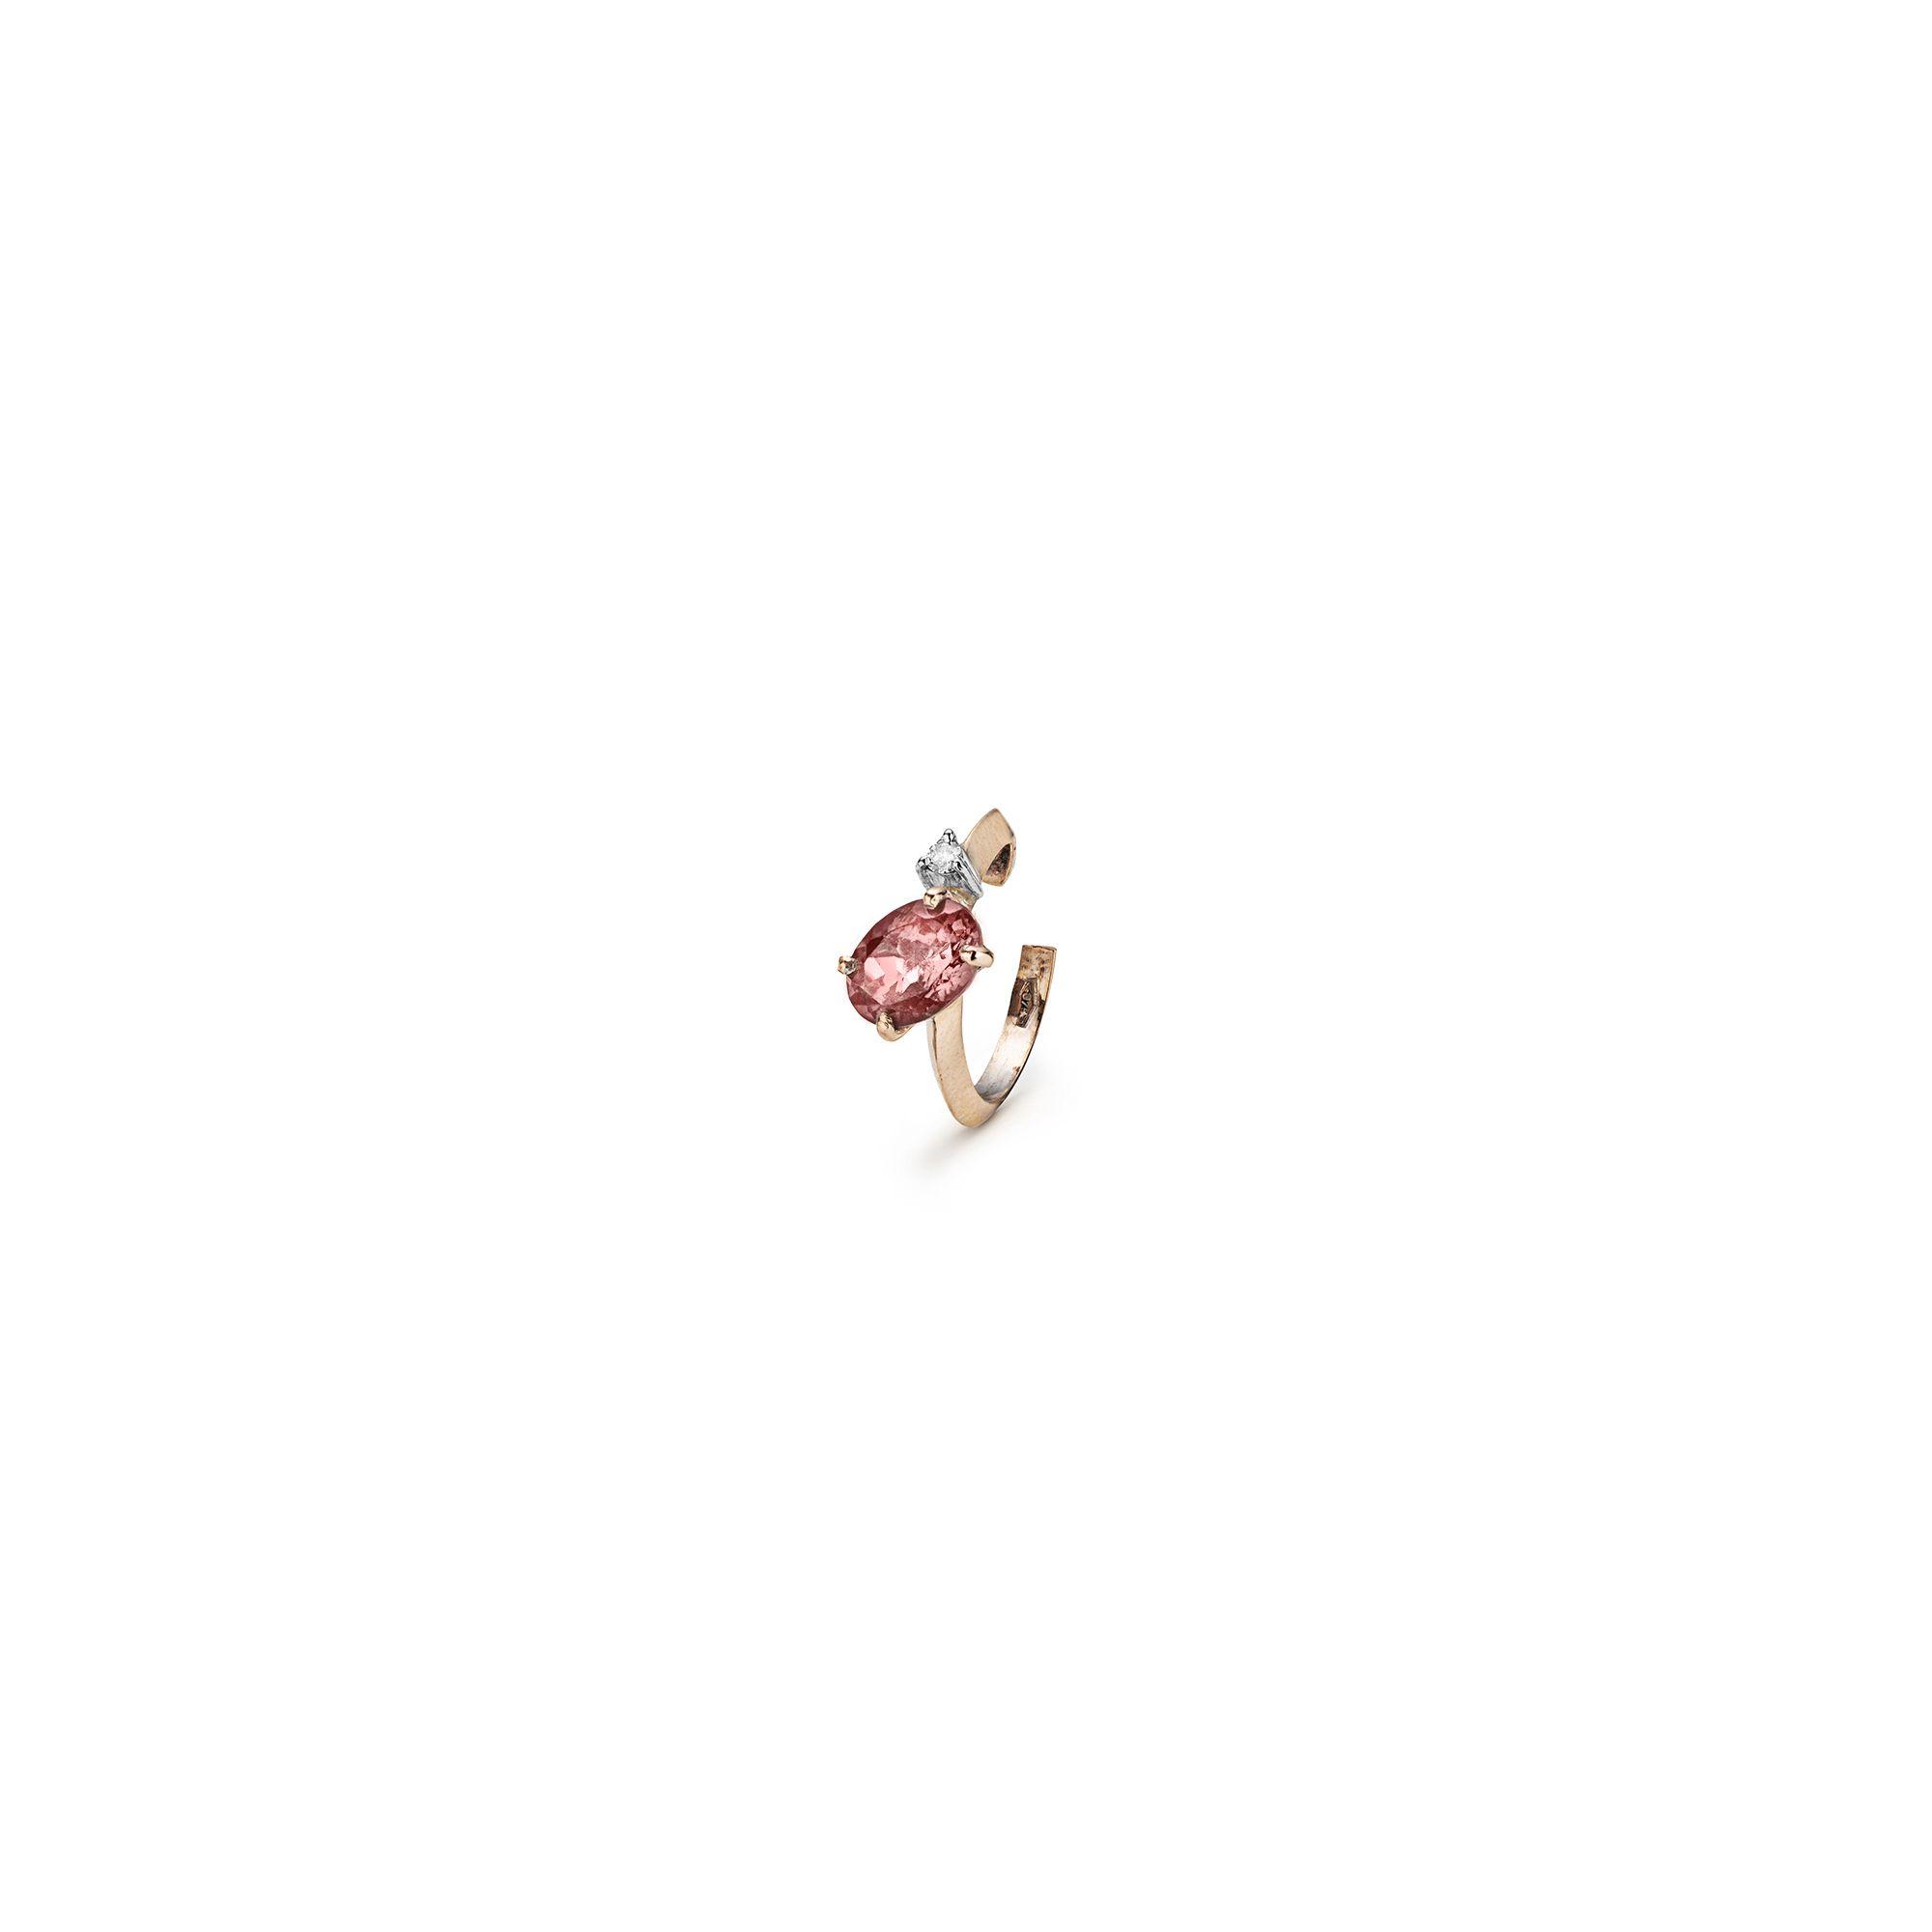 Tourmaline 'Balance' cuff earring Rose gold cartilage earring with pink tourmaline and diamonds